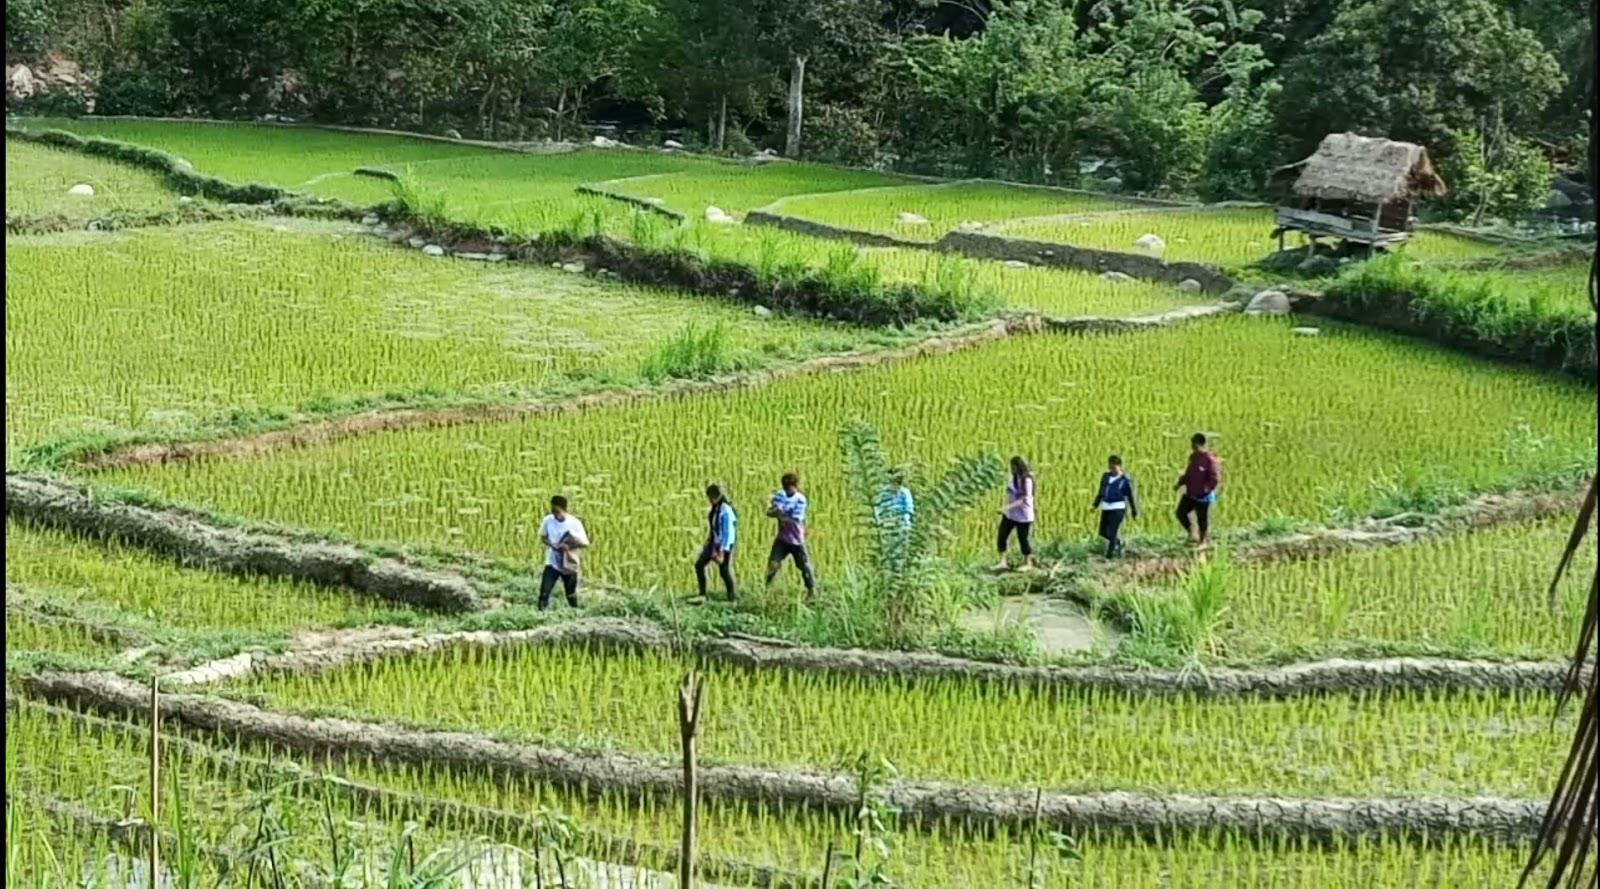 Suguhkan Air Sungai Tiga Warna, Tim Inovasi Desa Capture Objek Wisata Sepang Masanda